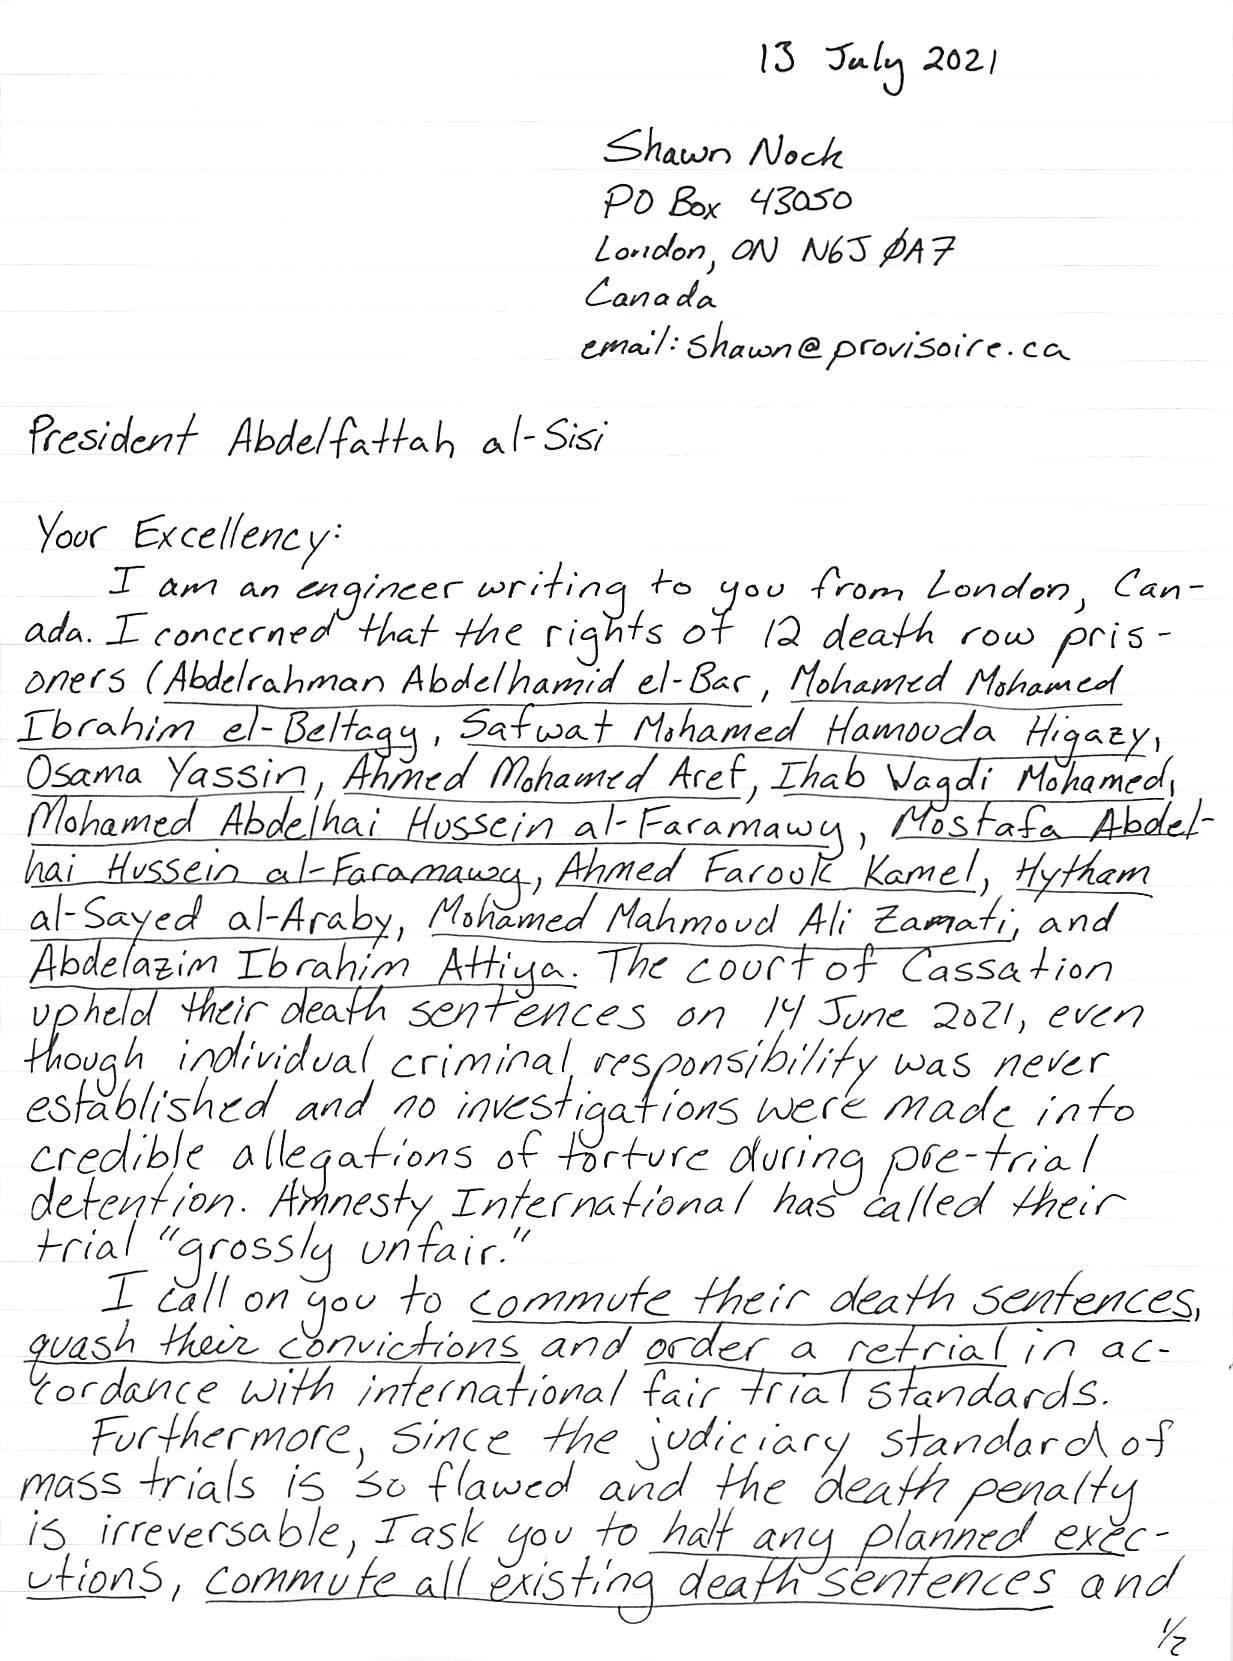 hand-written letter, transcript follows, page 1